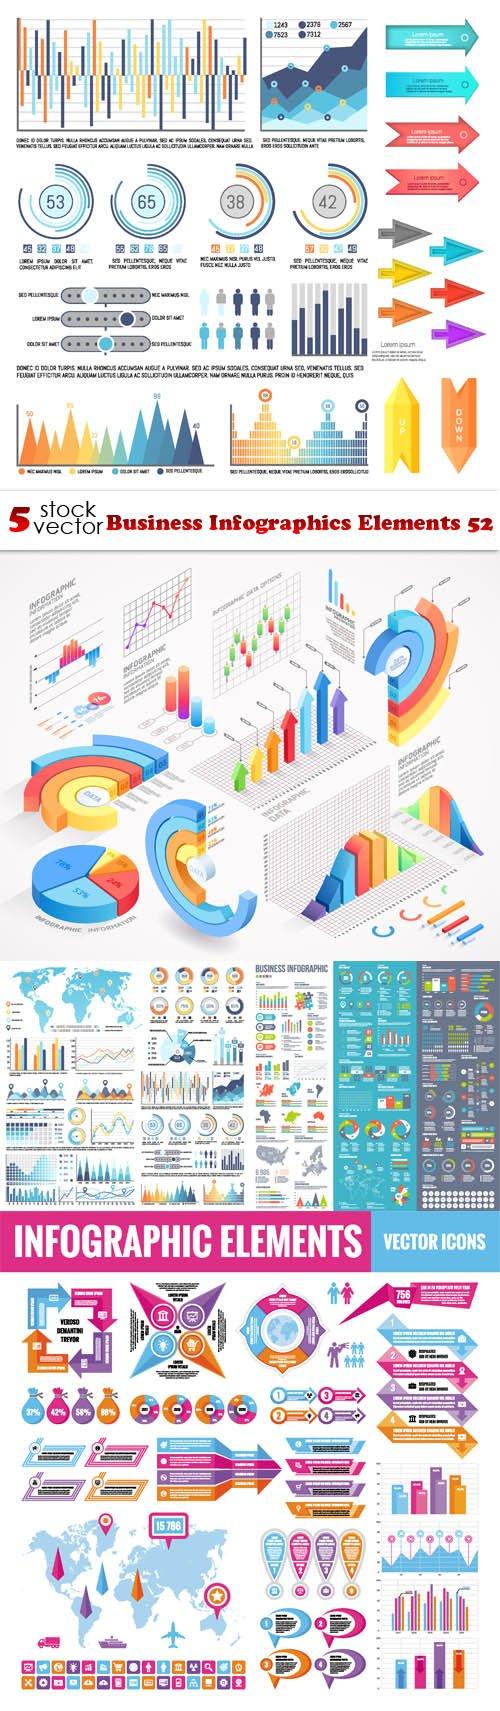 Vectors - Business Infographics Elements 52